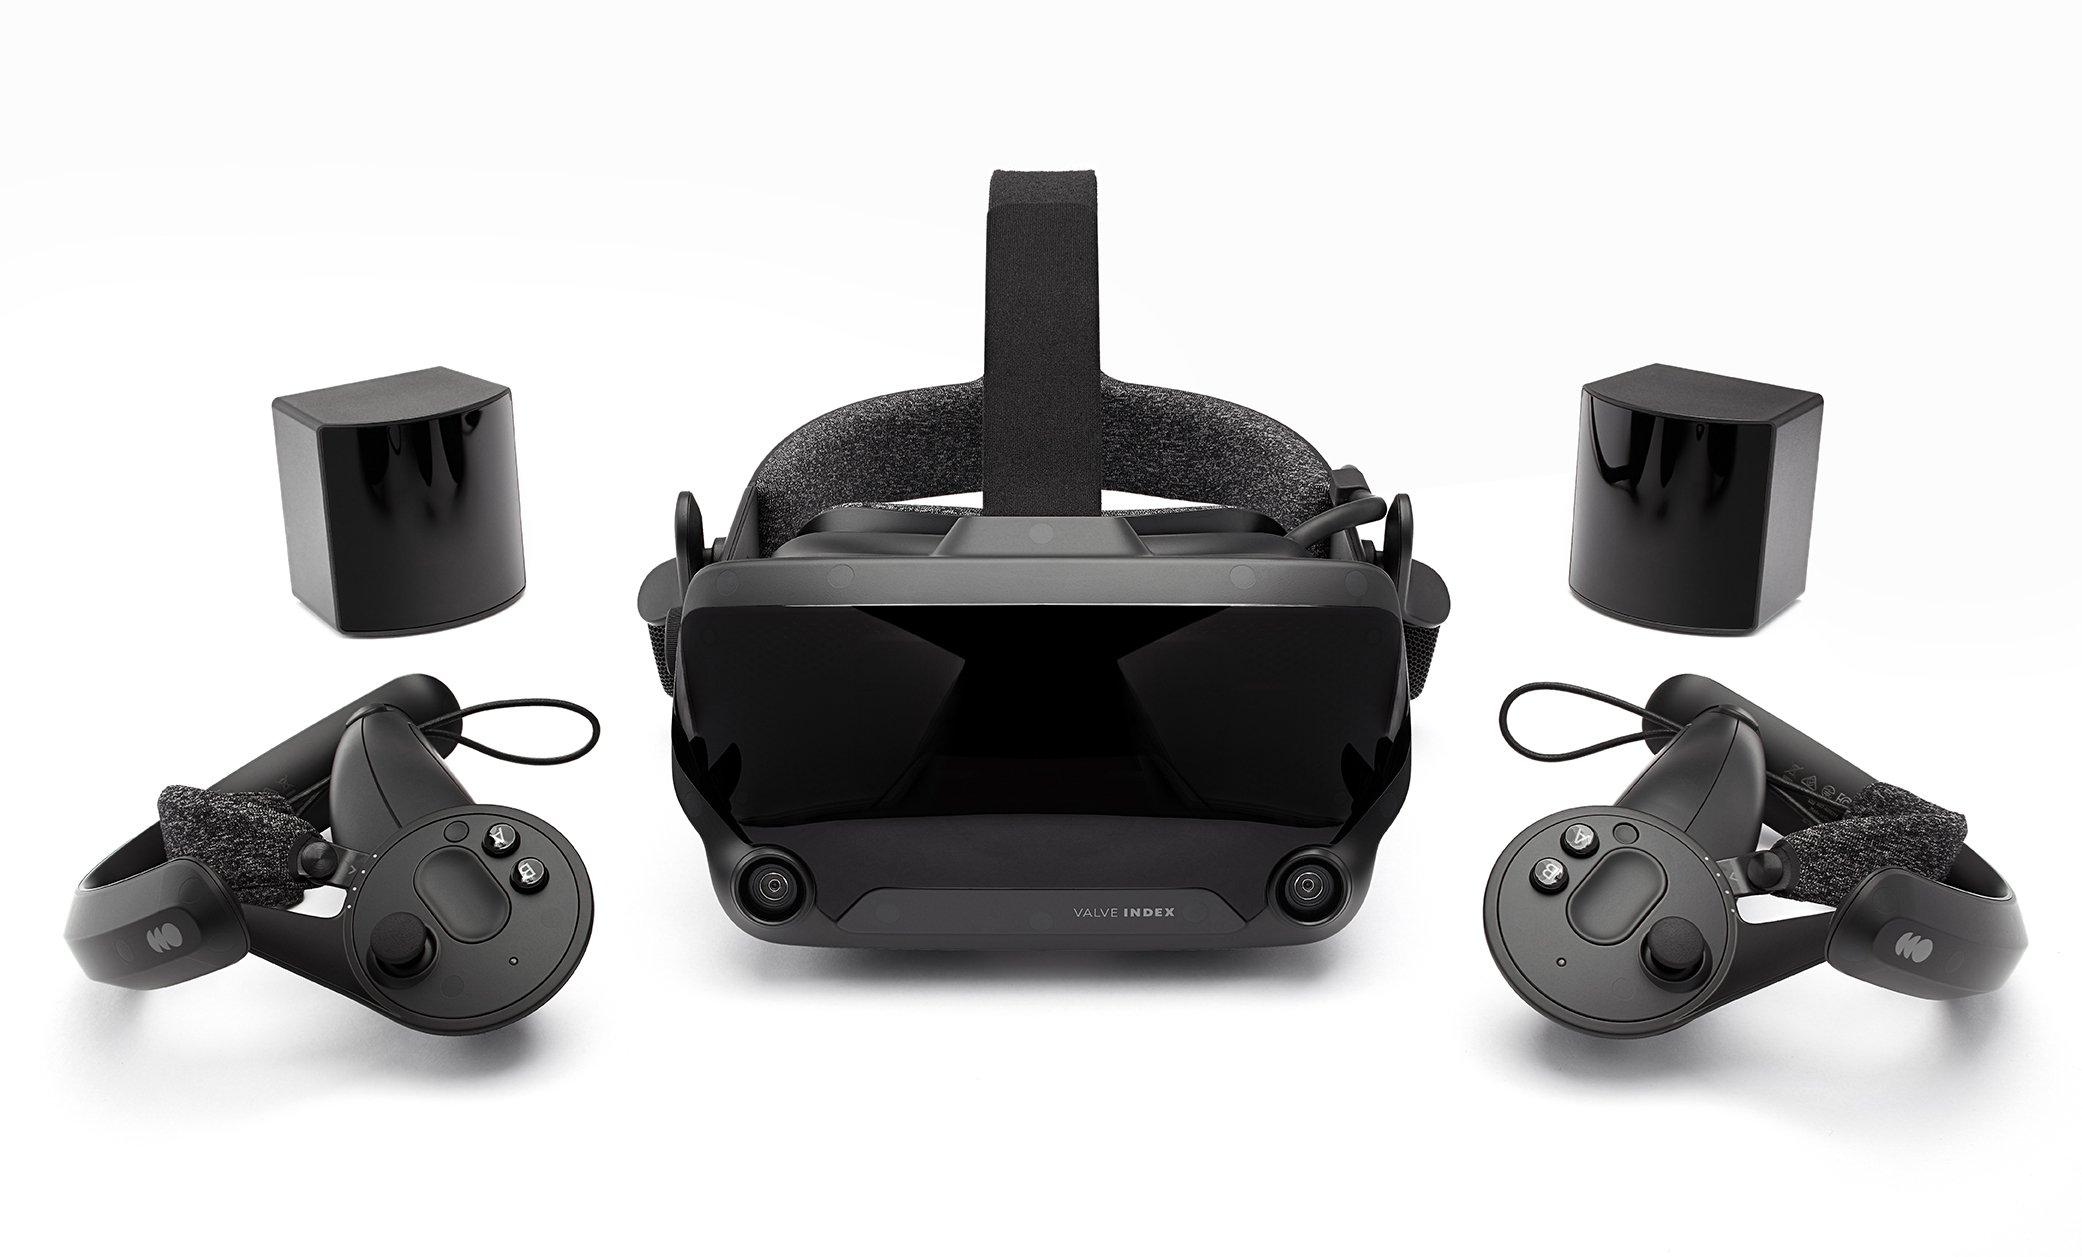 Valve Index VR HMD price, specs, release date, and preorder - Valve Index VR Kit